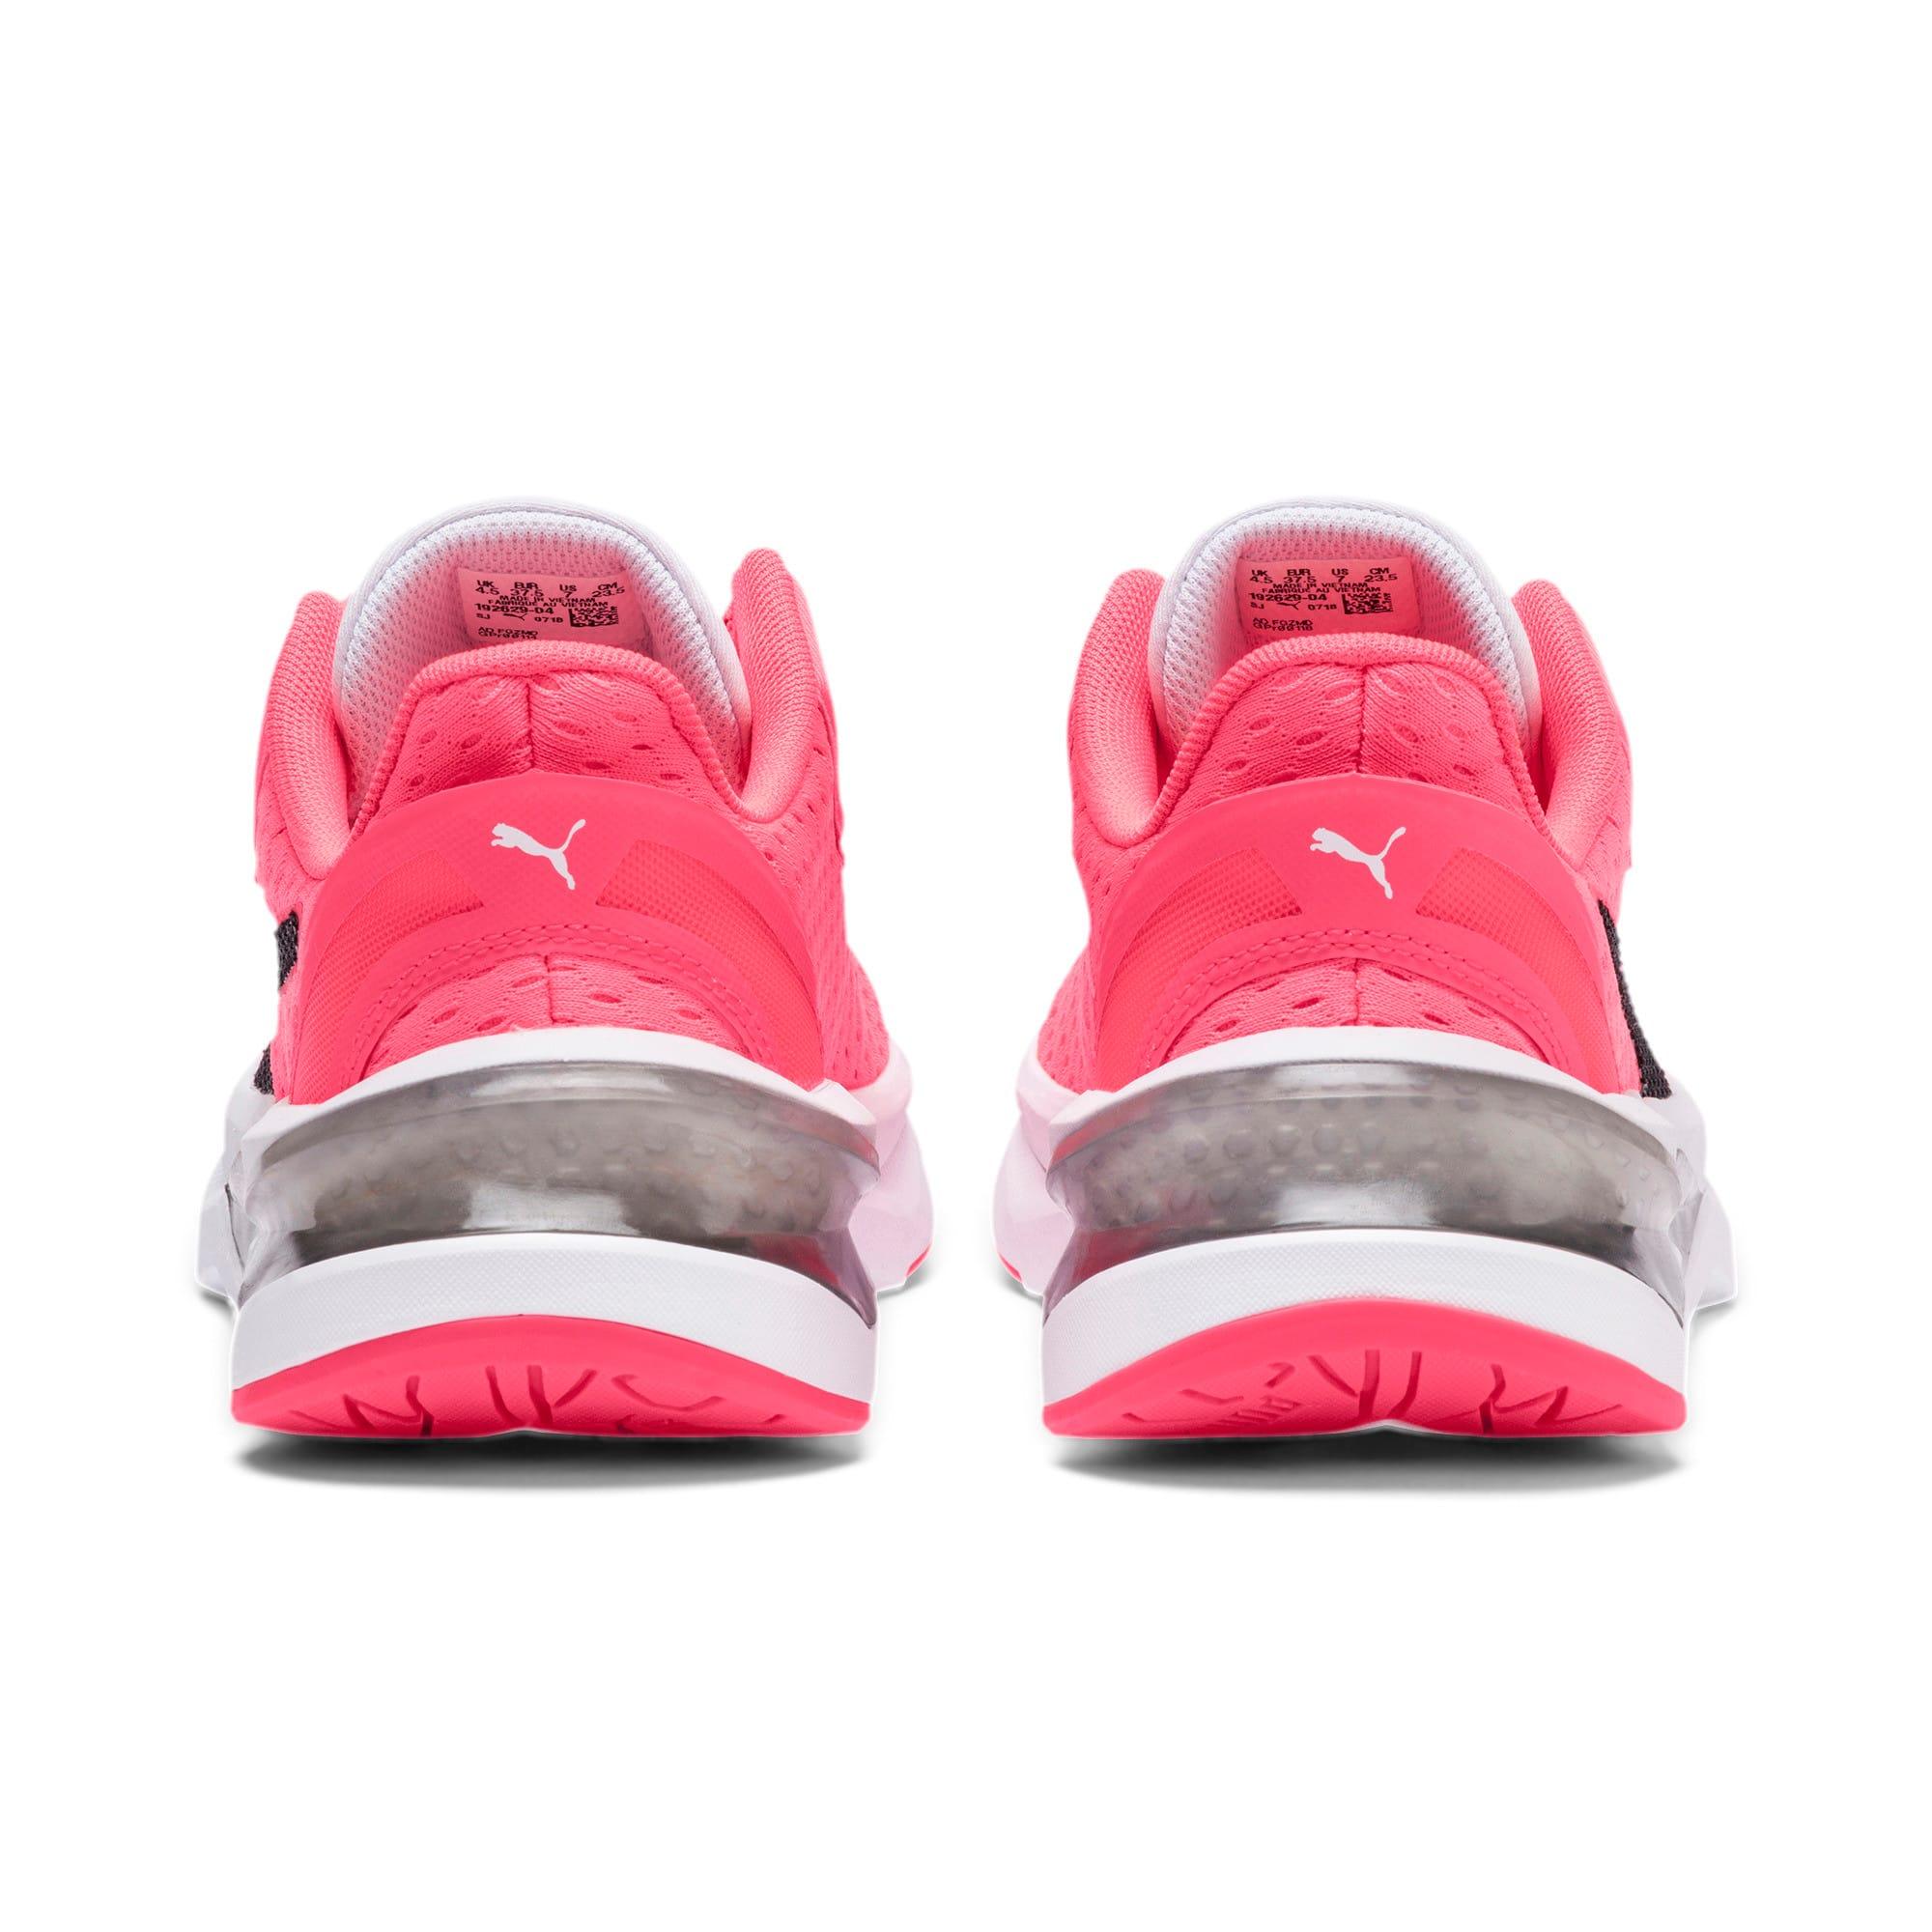 Thumbnail 4 of LQDCELL Shatter XT Women's Training Shoes, Pink Alert-Puma White, medium